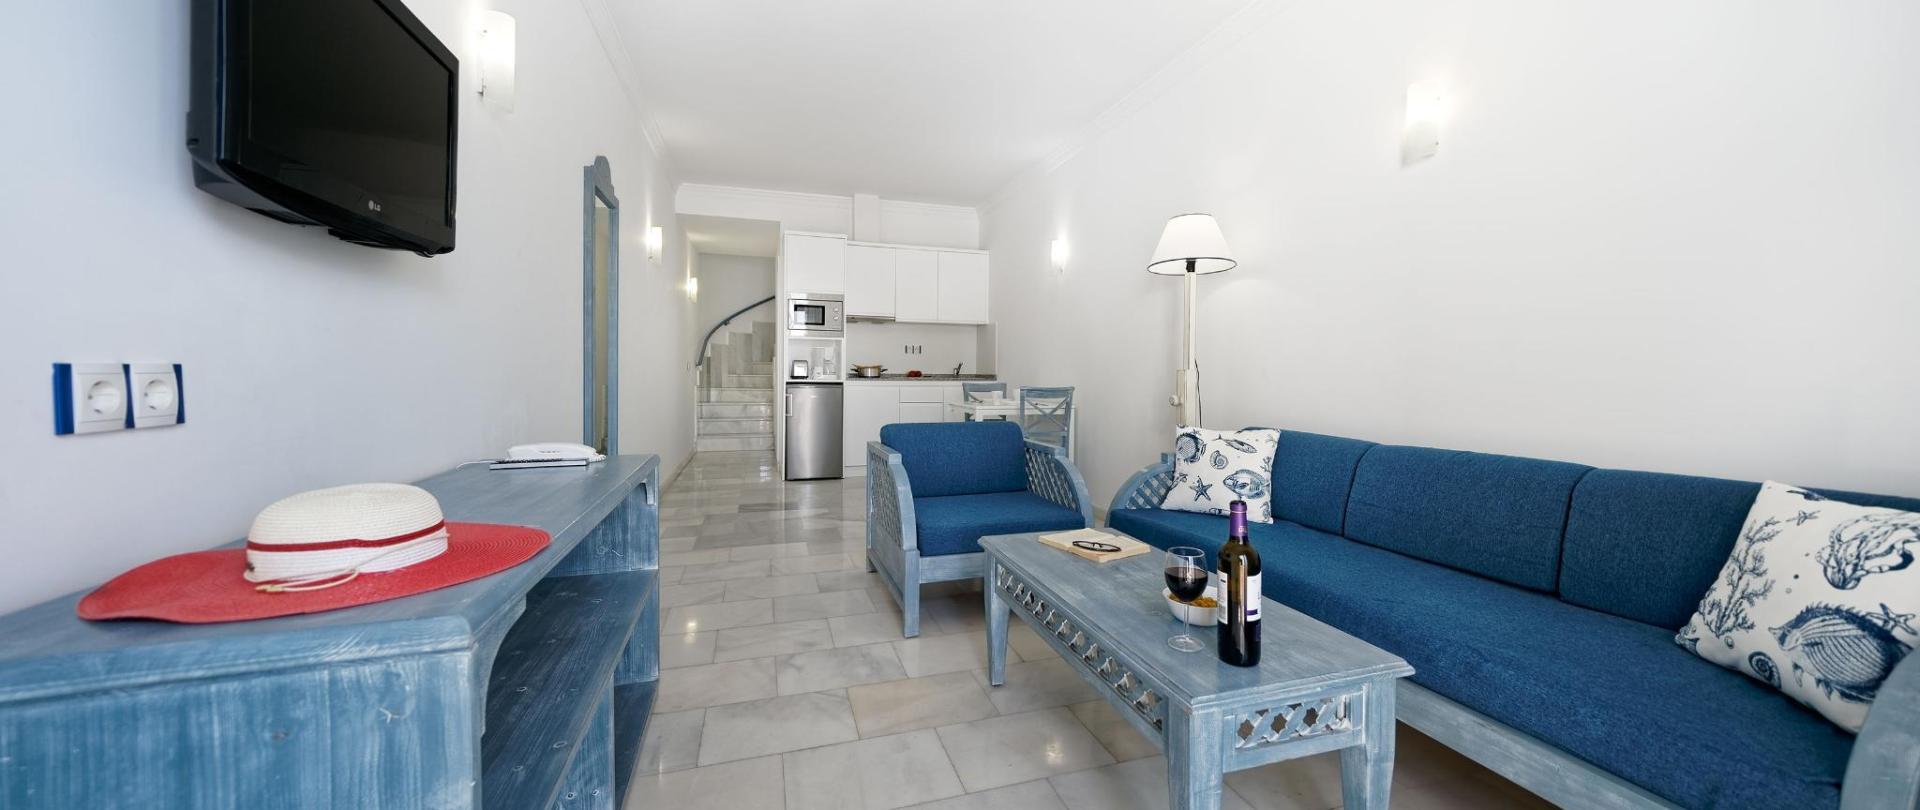 Salón Apartamento Igramar Morro Jable.jpg